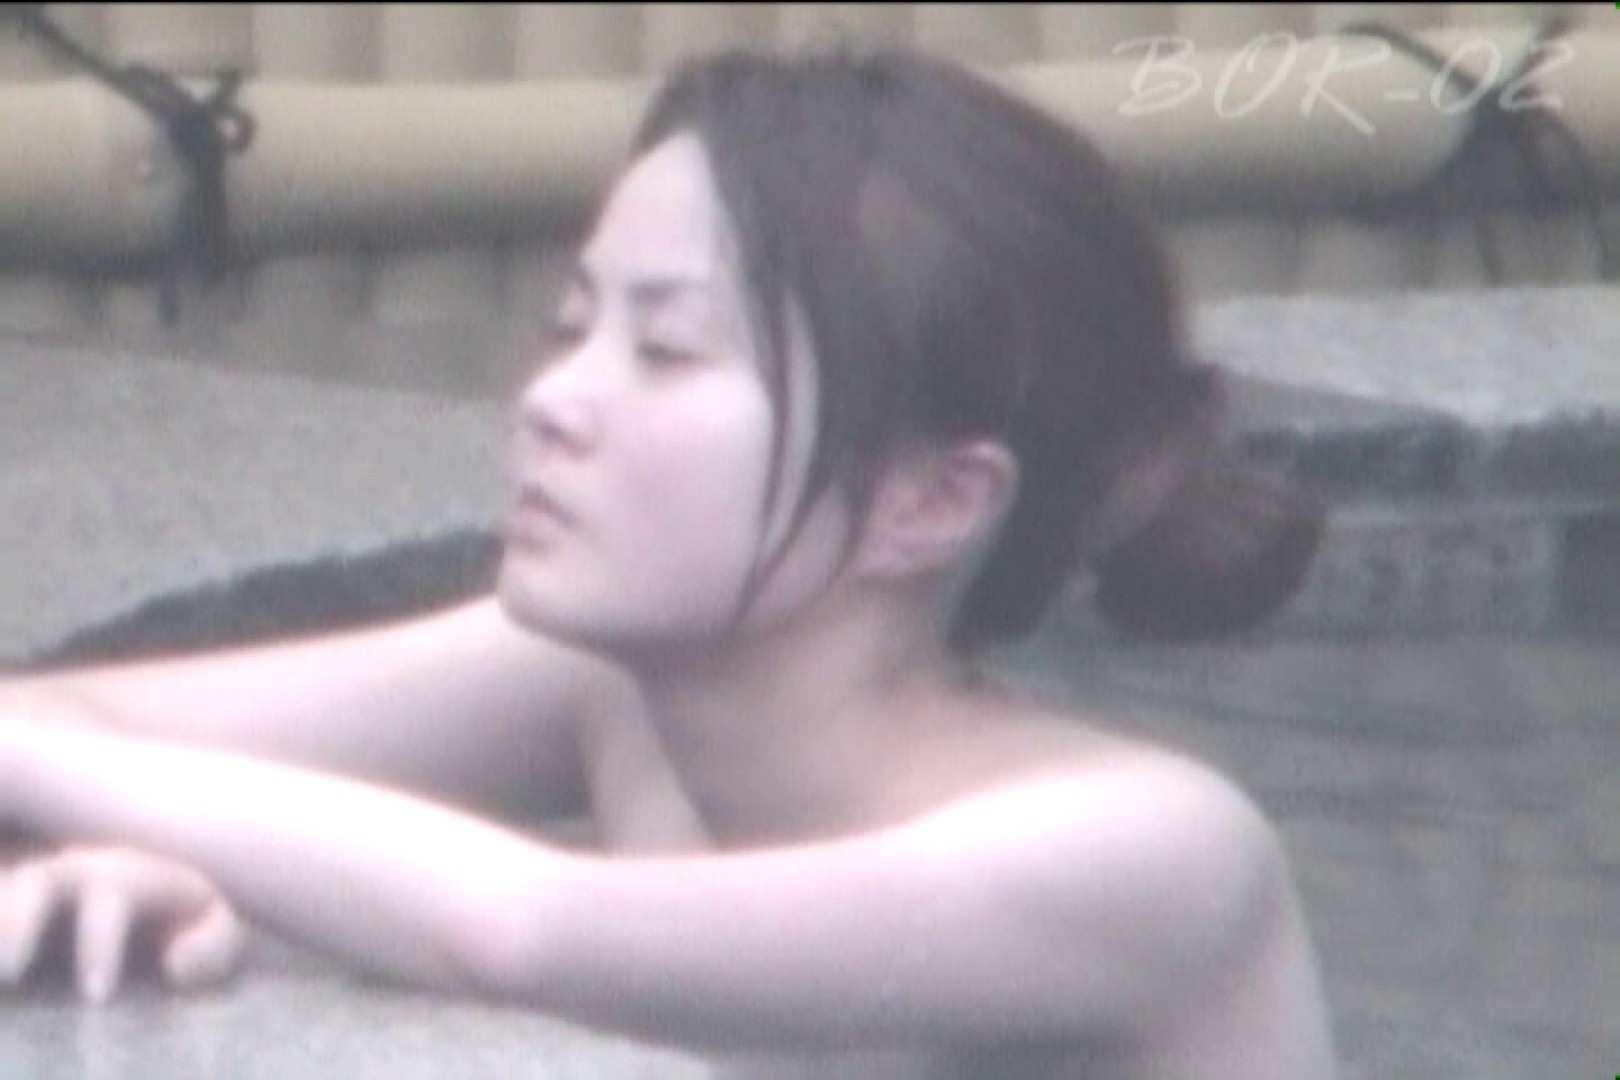 Aquaな露天風呂Vol.474 盗撮シリーズ | 露天風呂編  111PIX 61